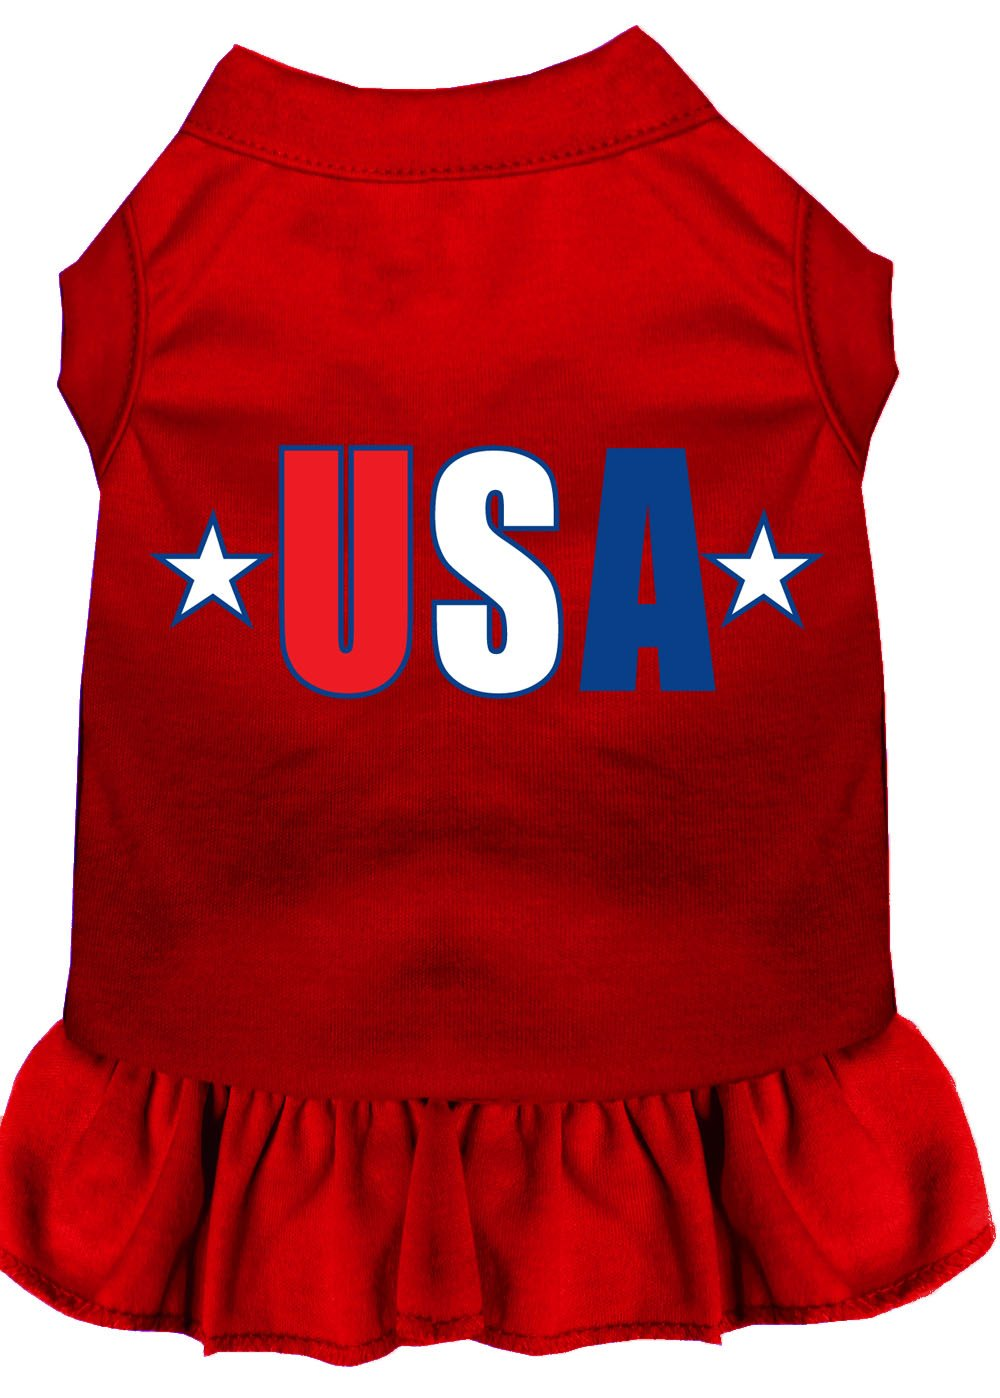 Mirage Pet Products 58-41 4XRD USA Star Screen Print Dress, 4X-Large, Red